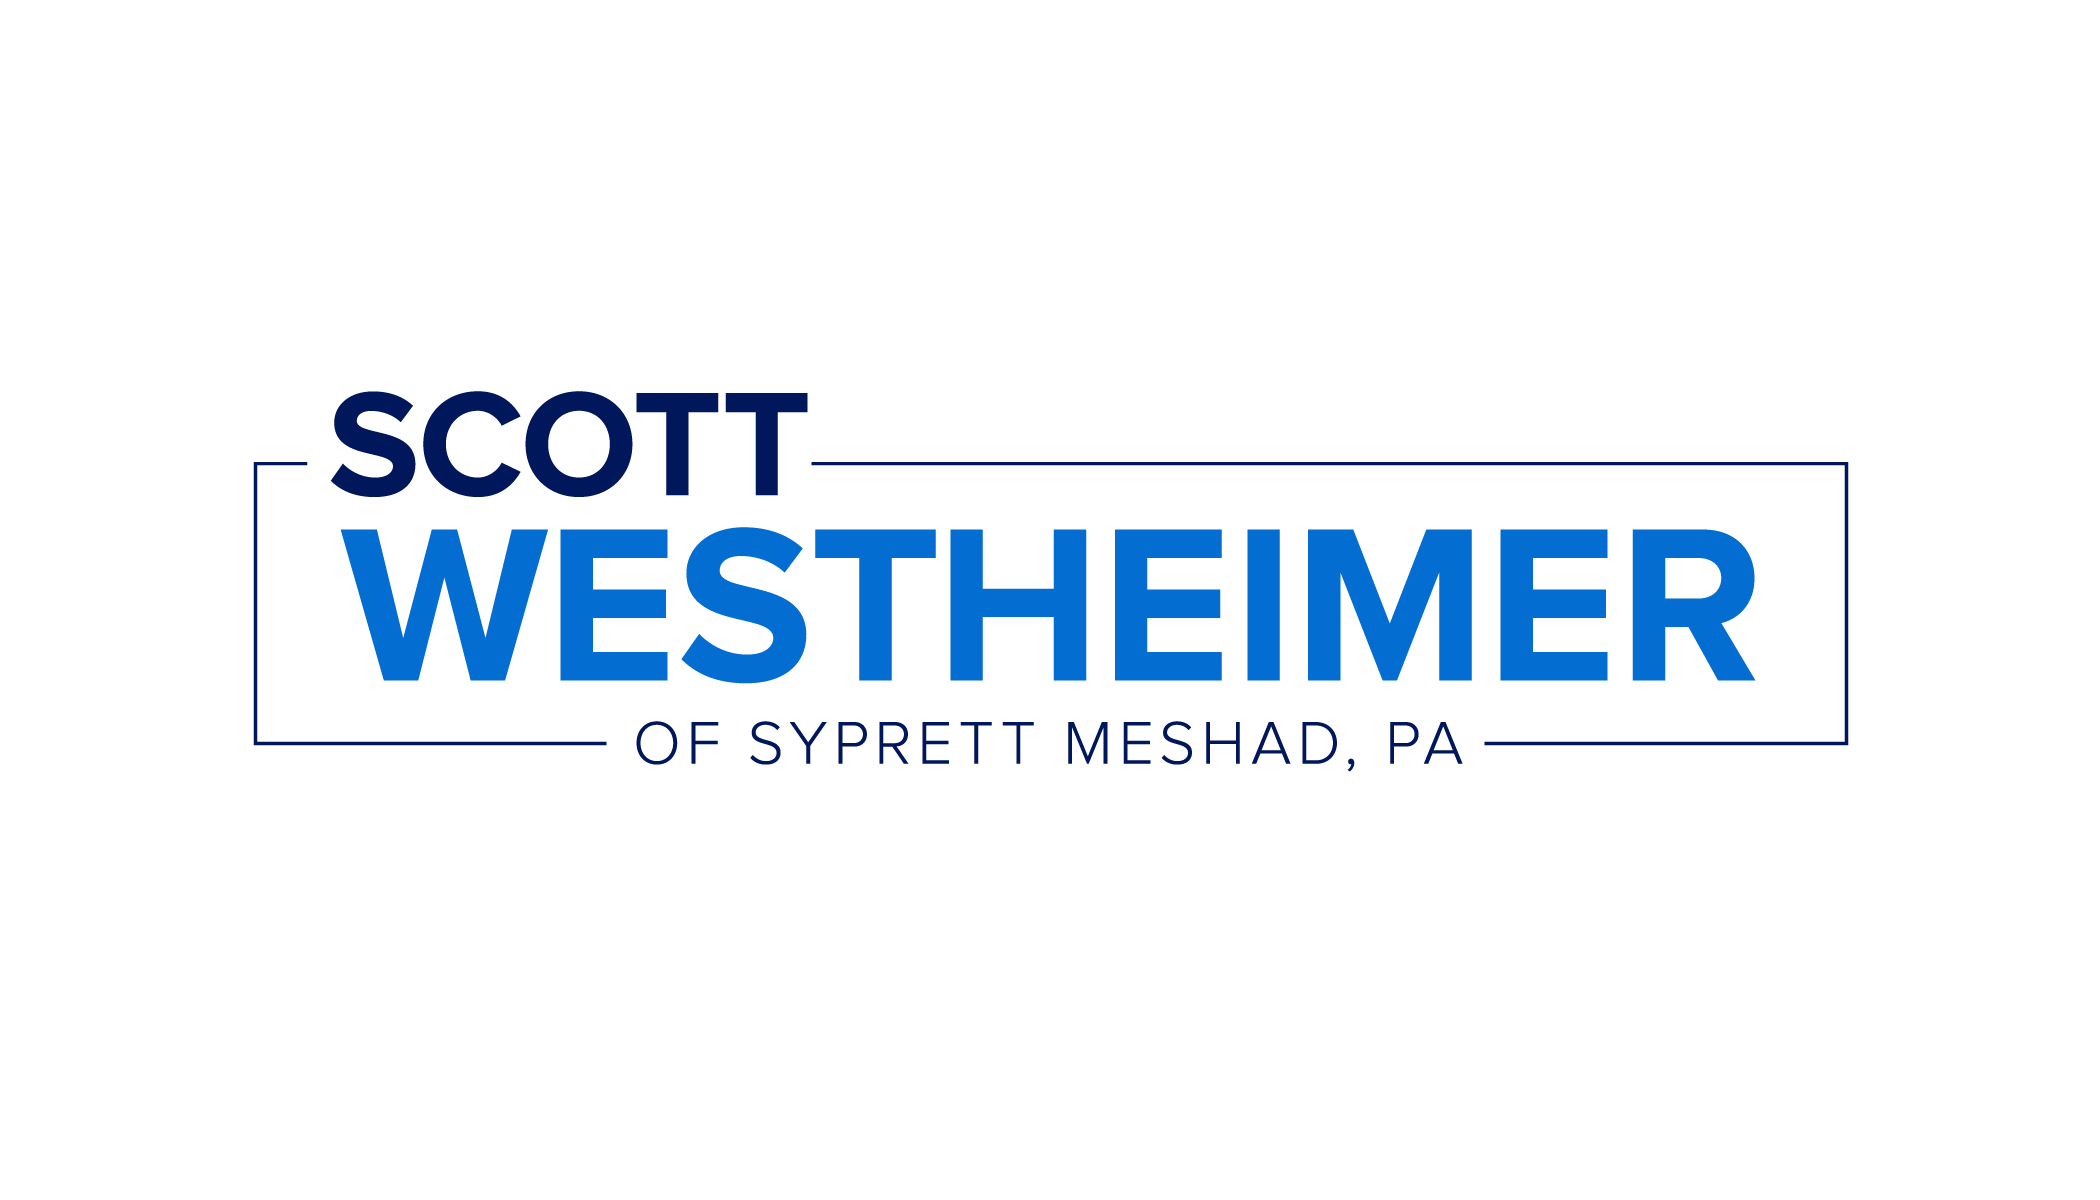 Scott Westheimer of Syprett Meshad, PA